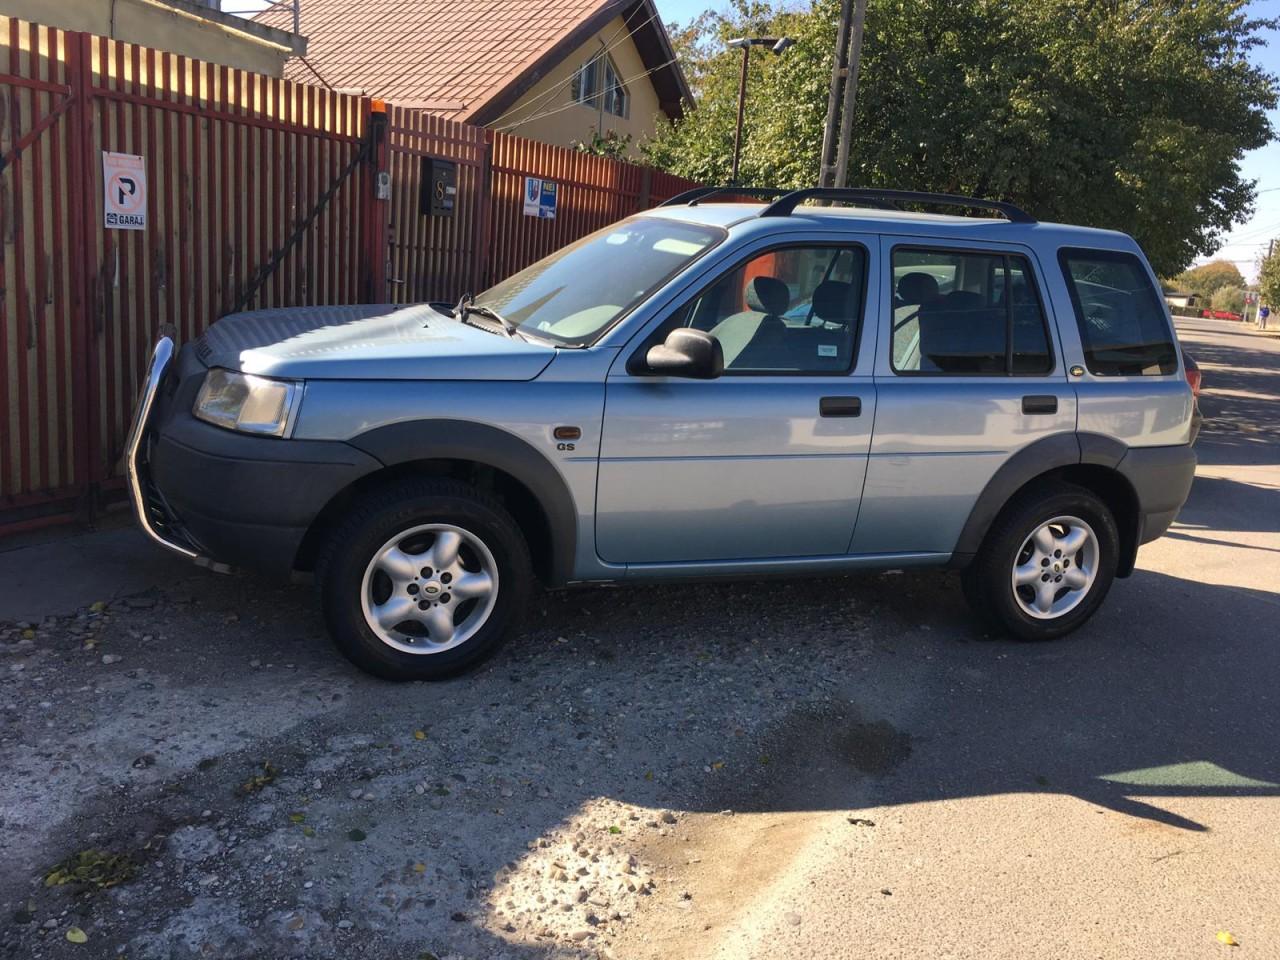 Land-Rover Freelander 1.8 2002